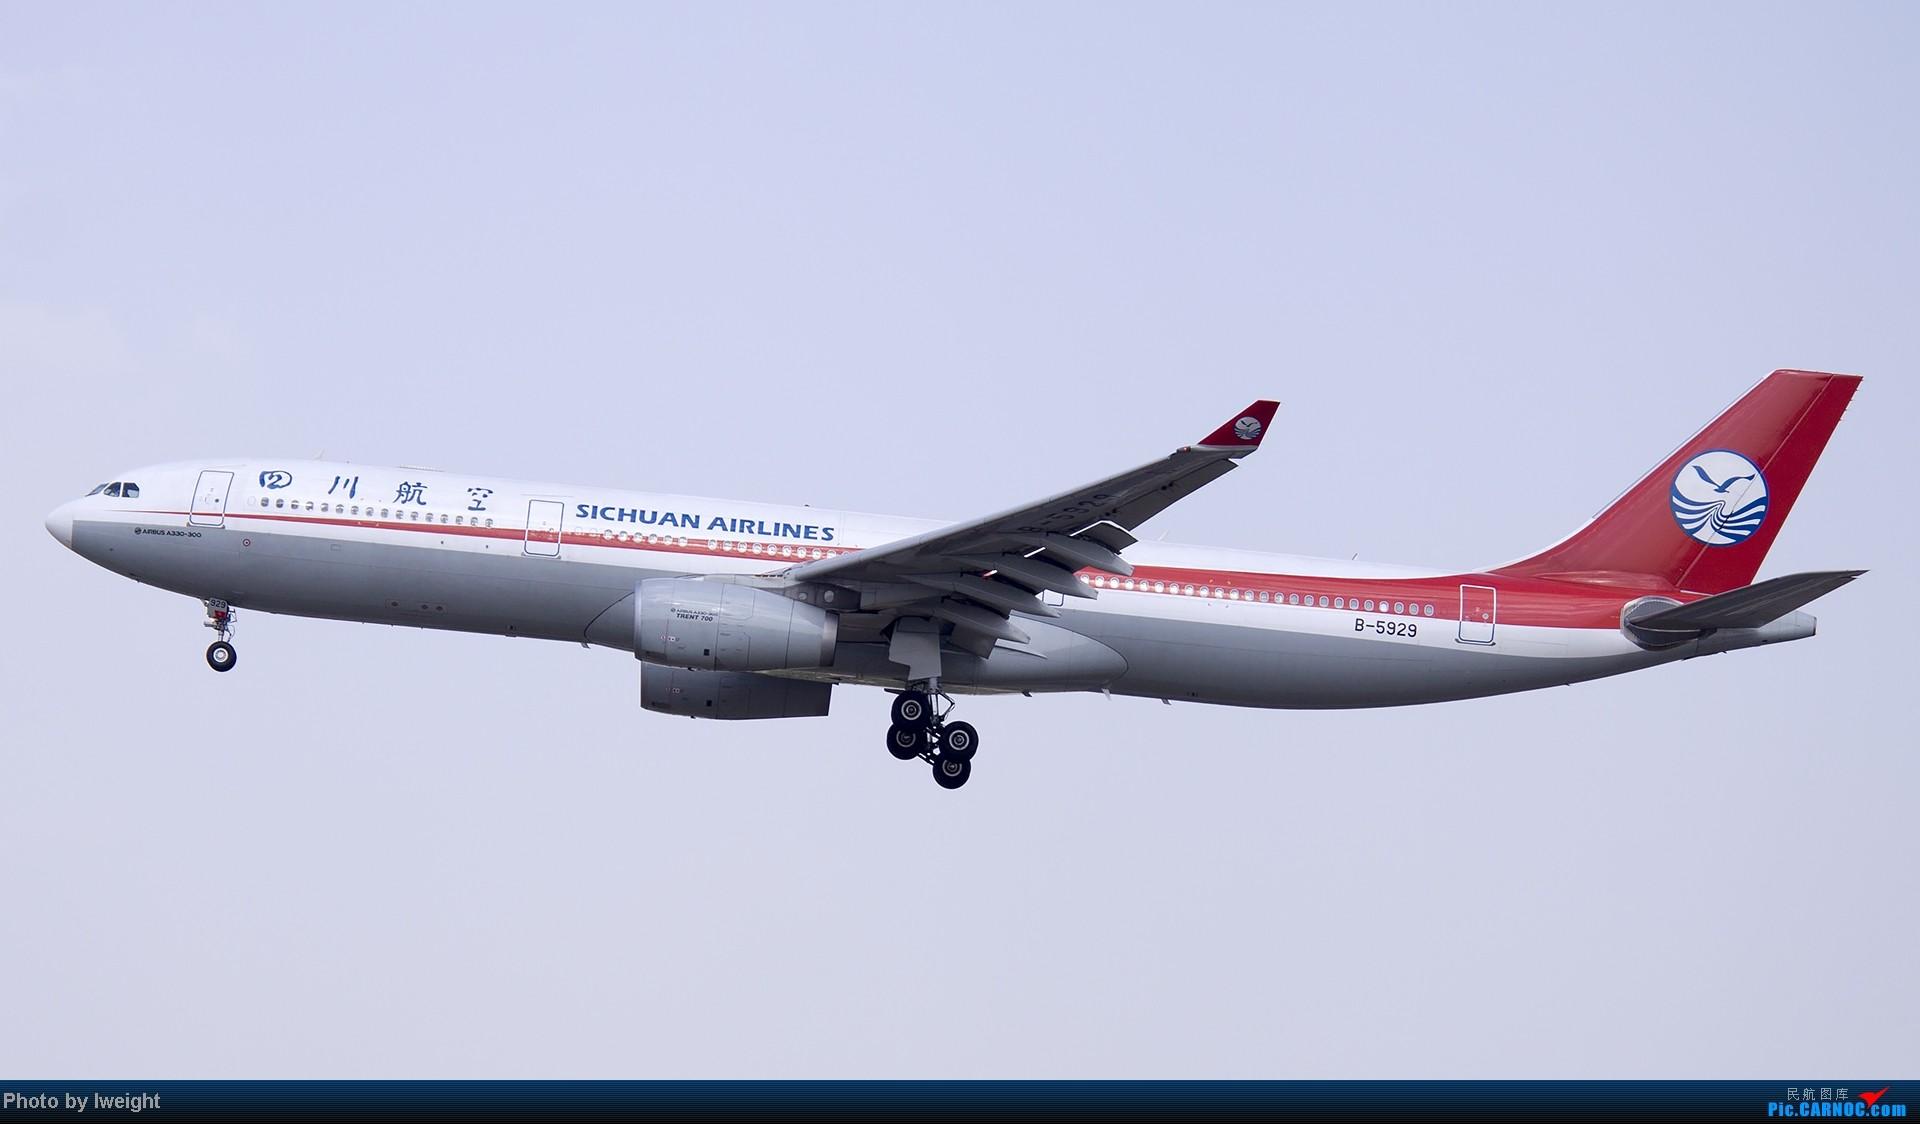 Re:[原创]5月3日首都机场风云变幻的下午 AIRBUS A330-300 B-5929 中国北京首都机场